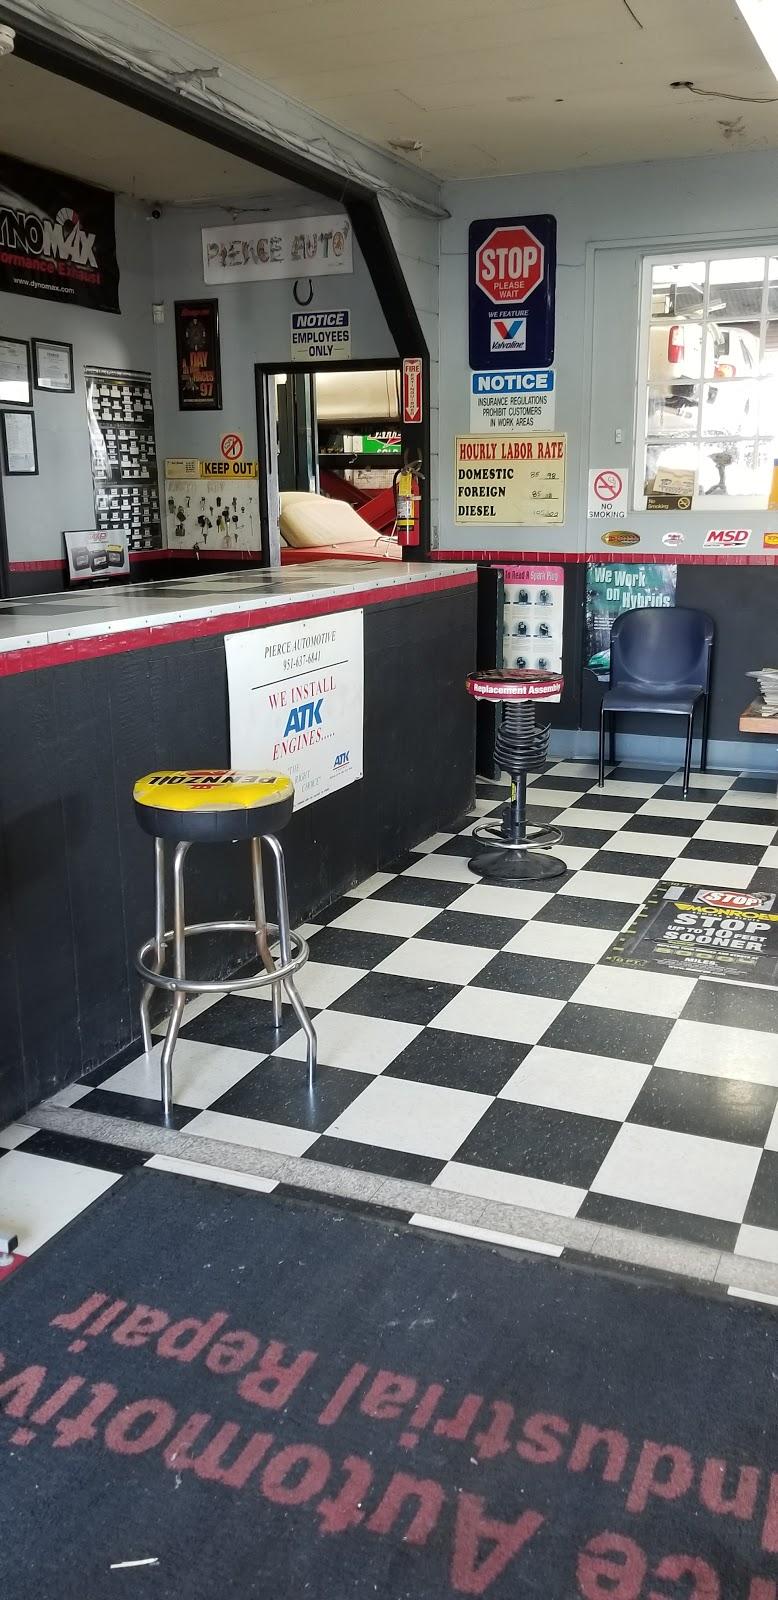 pierce automotive - car repair    Photo 7 of 10   Address: 10941 Hole Ave, Riverside, CA 92505, USA   Phone: (951) 637-6841